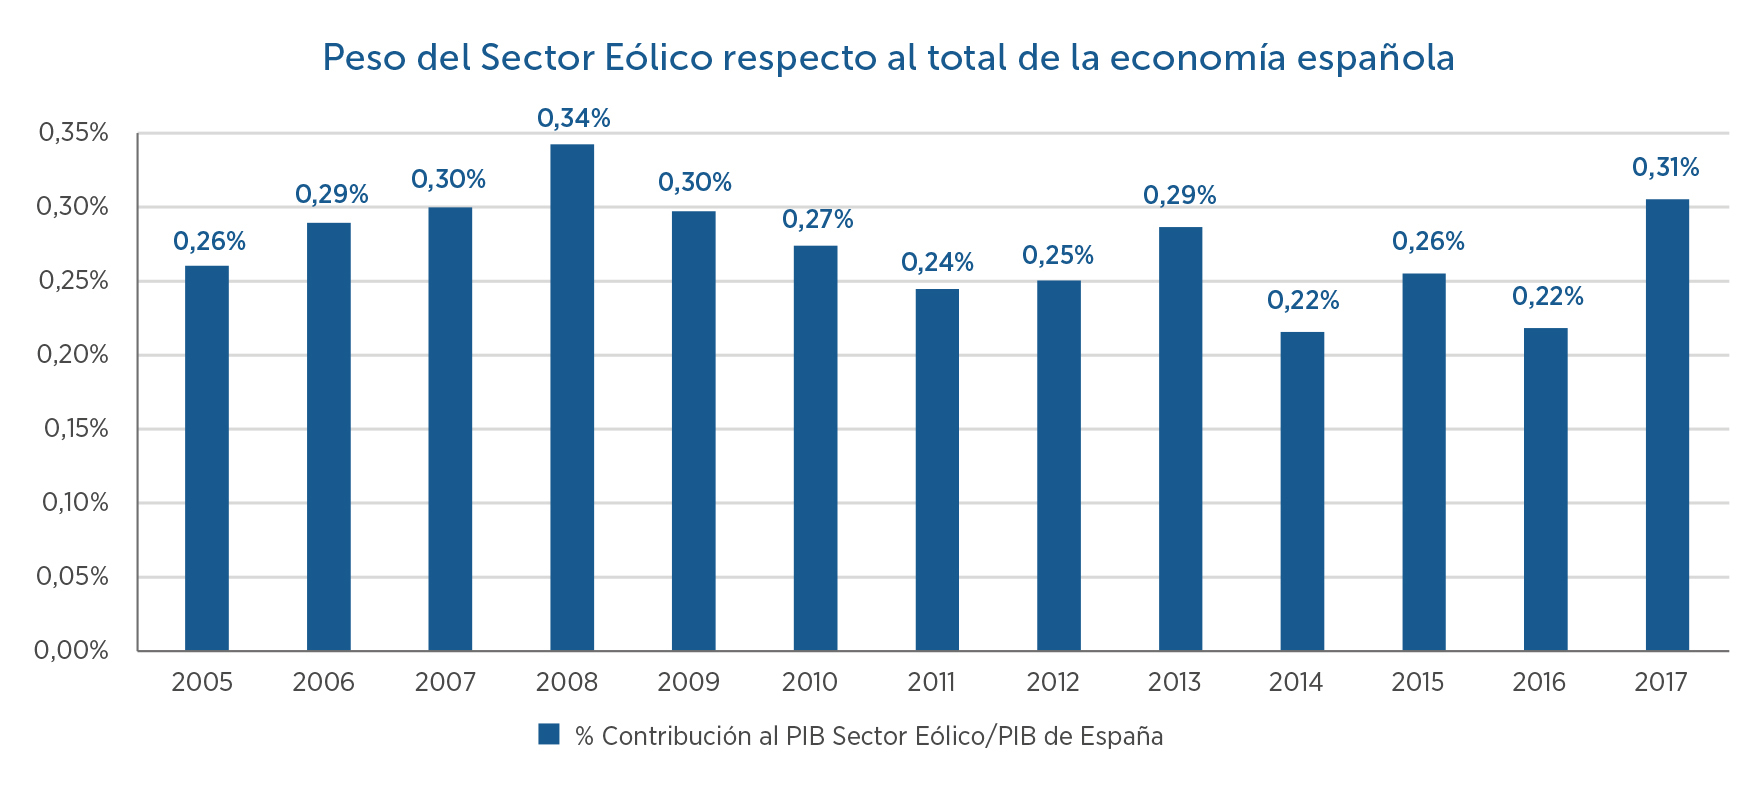 10-Peso-sector-eolico-respecto-a-total-economa